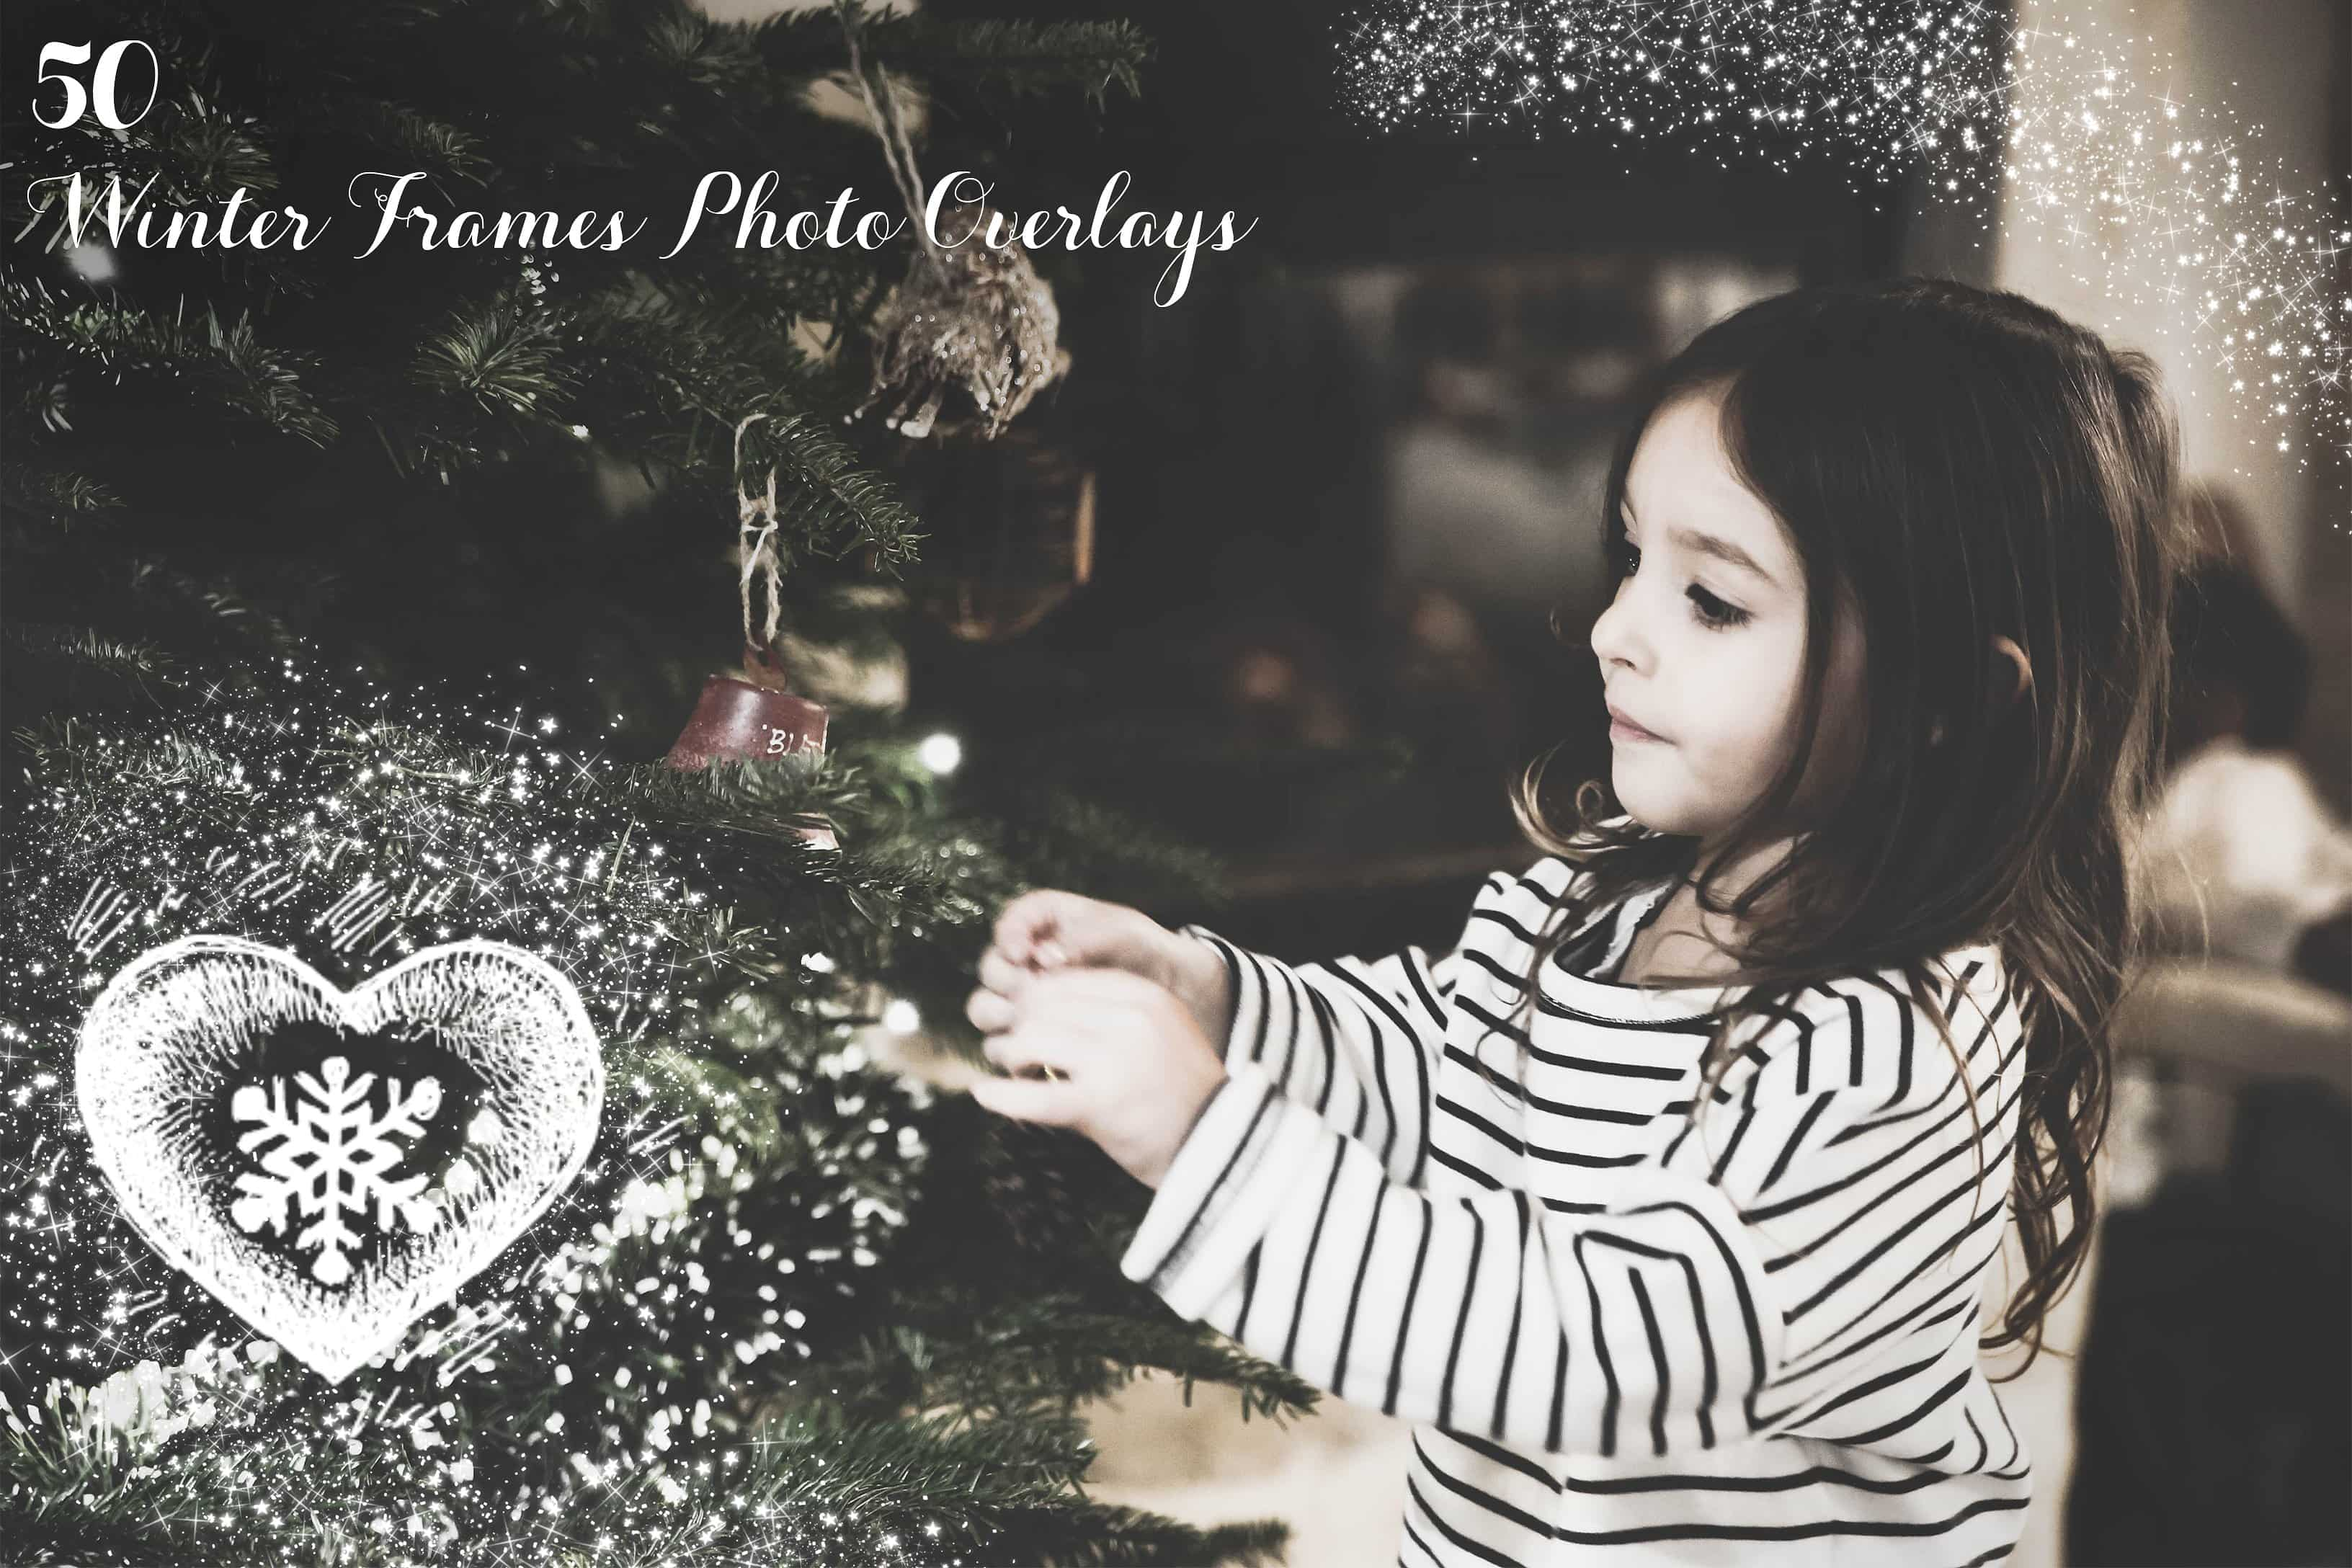 2500+ Christmas & Winter Overlays Bundle - $29 - 28 min